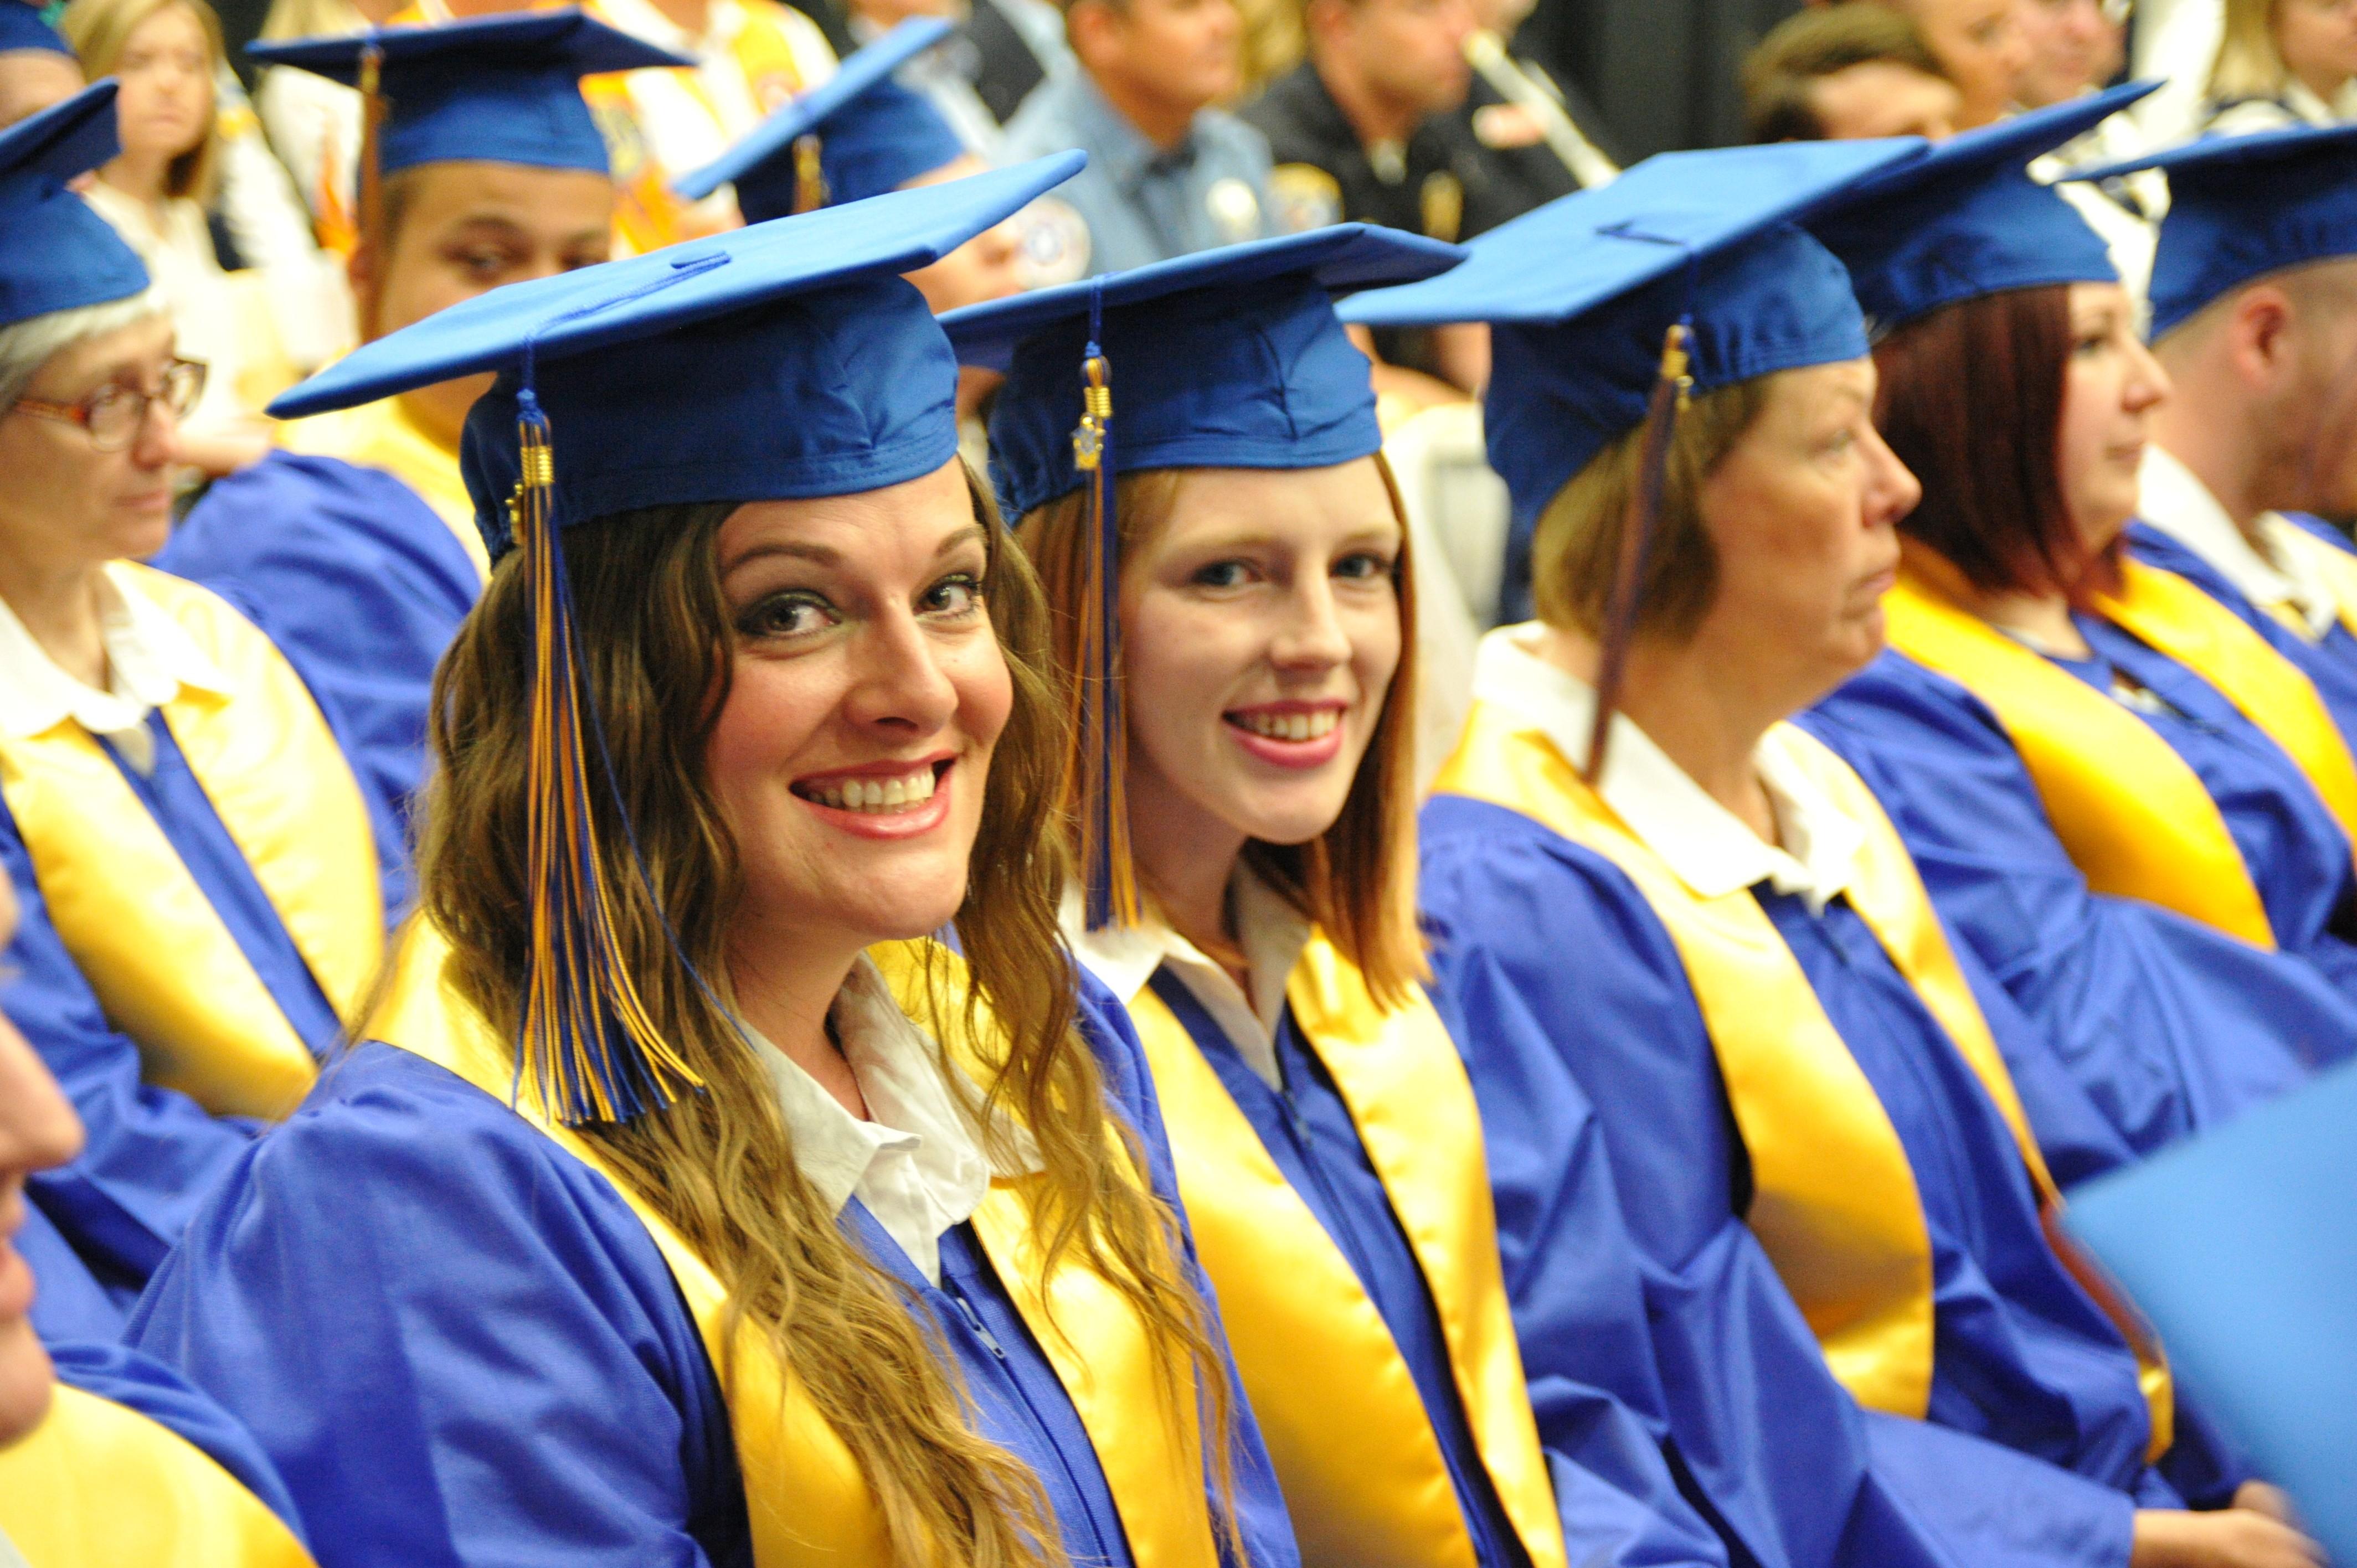 Two Walmart Academy graduates smiling